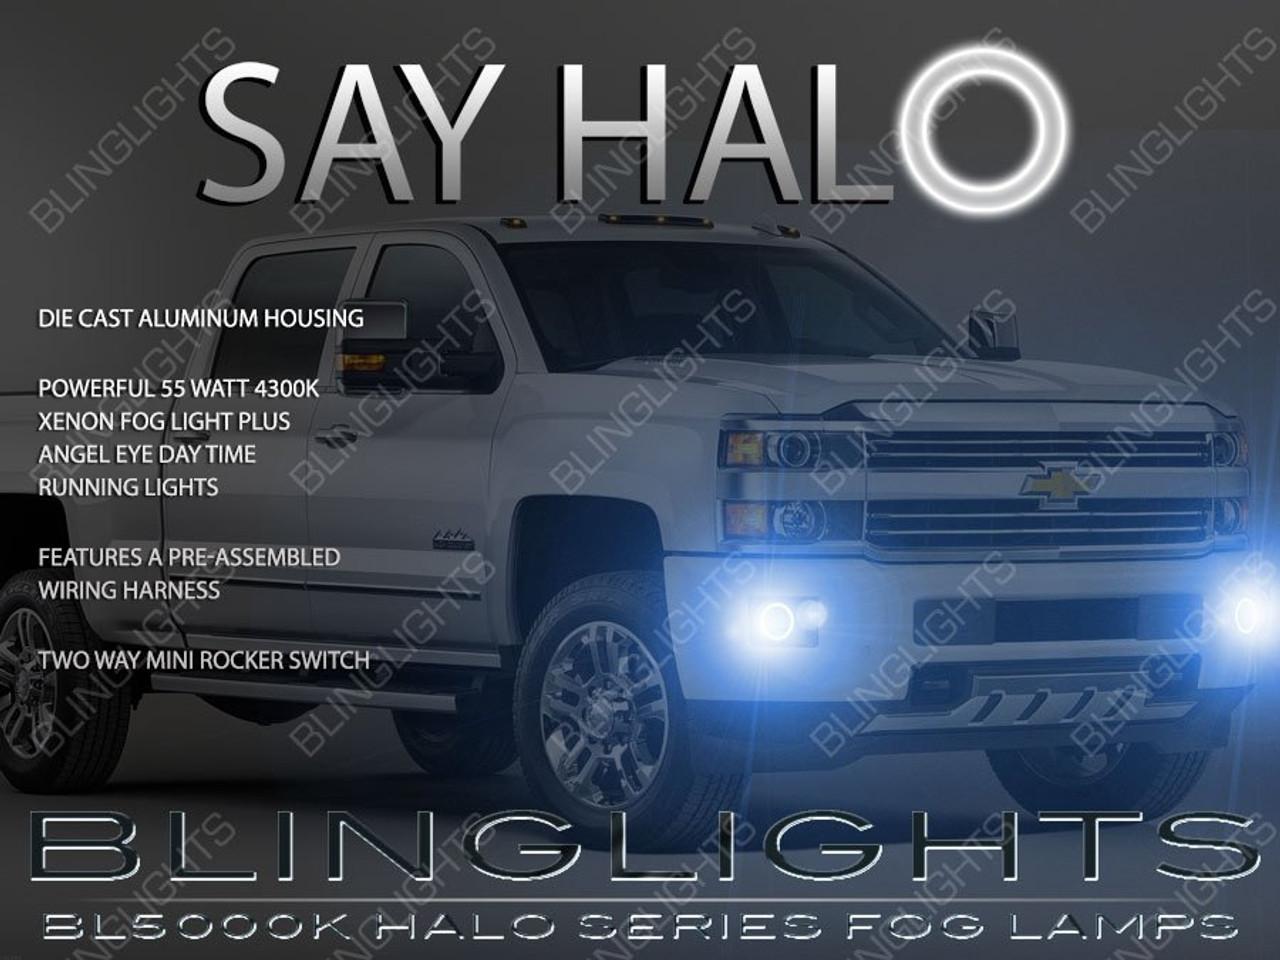 2015 2016 2017 chevrolet silverado 1500 angel eye fog lights lamps kit -  blinglights com